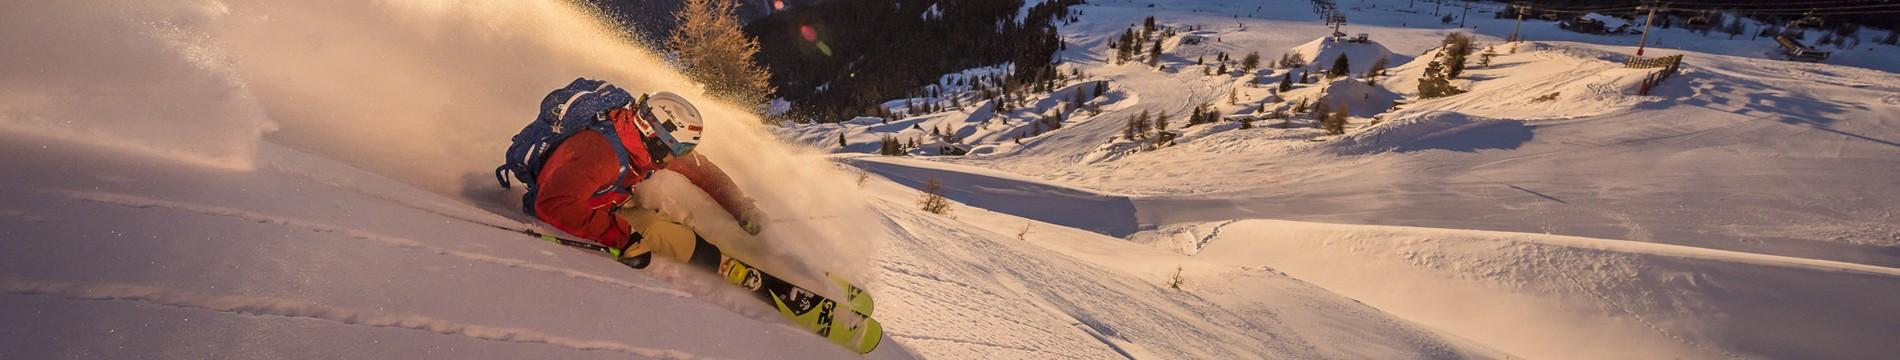 peisey-vallandry-hiver-ski-glisse-shu-6955